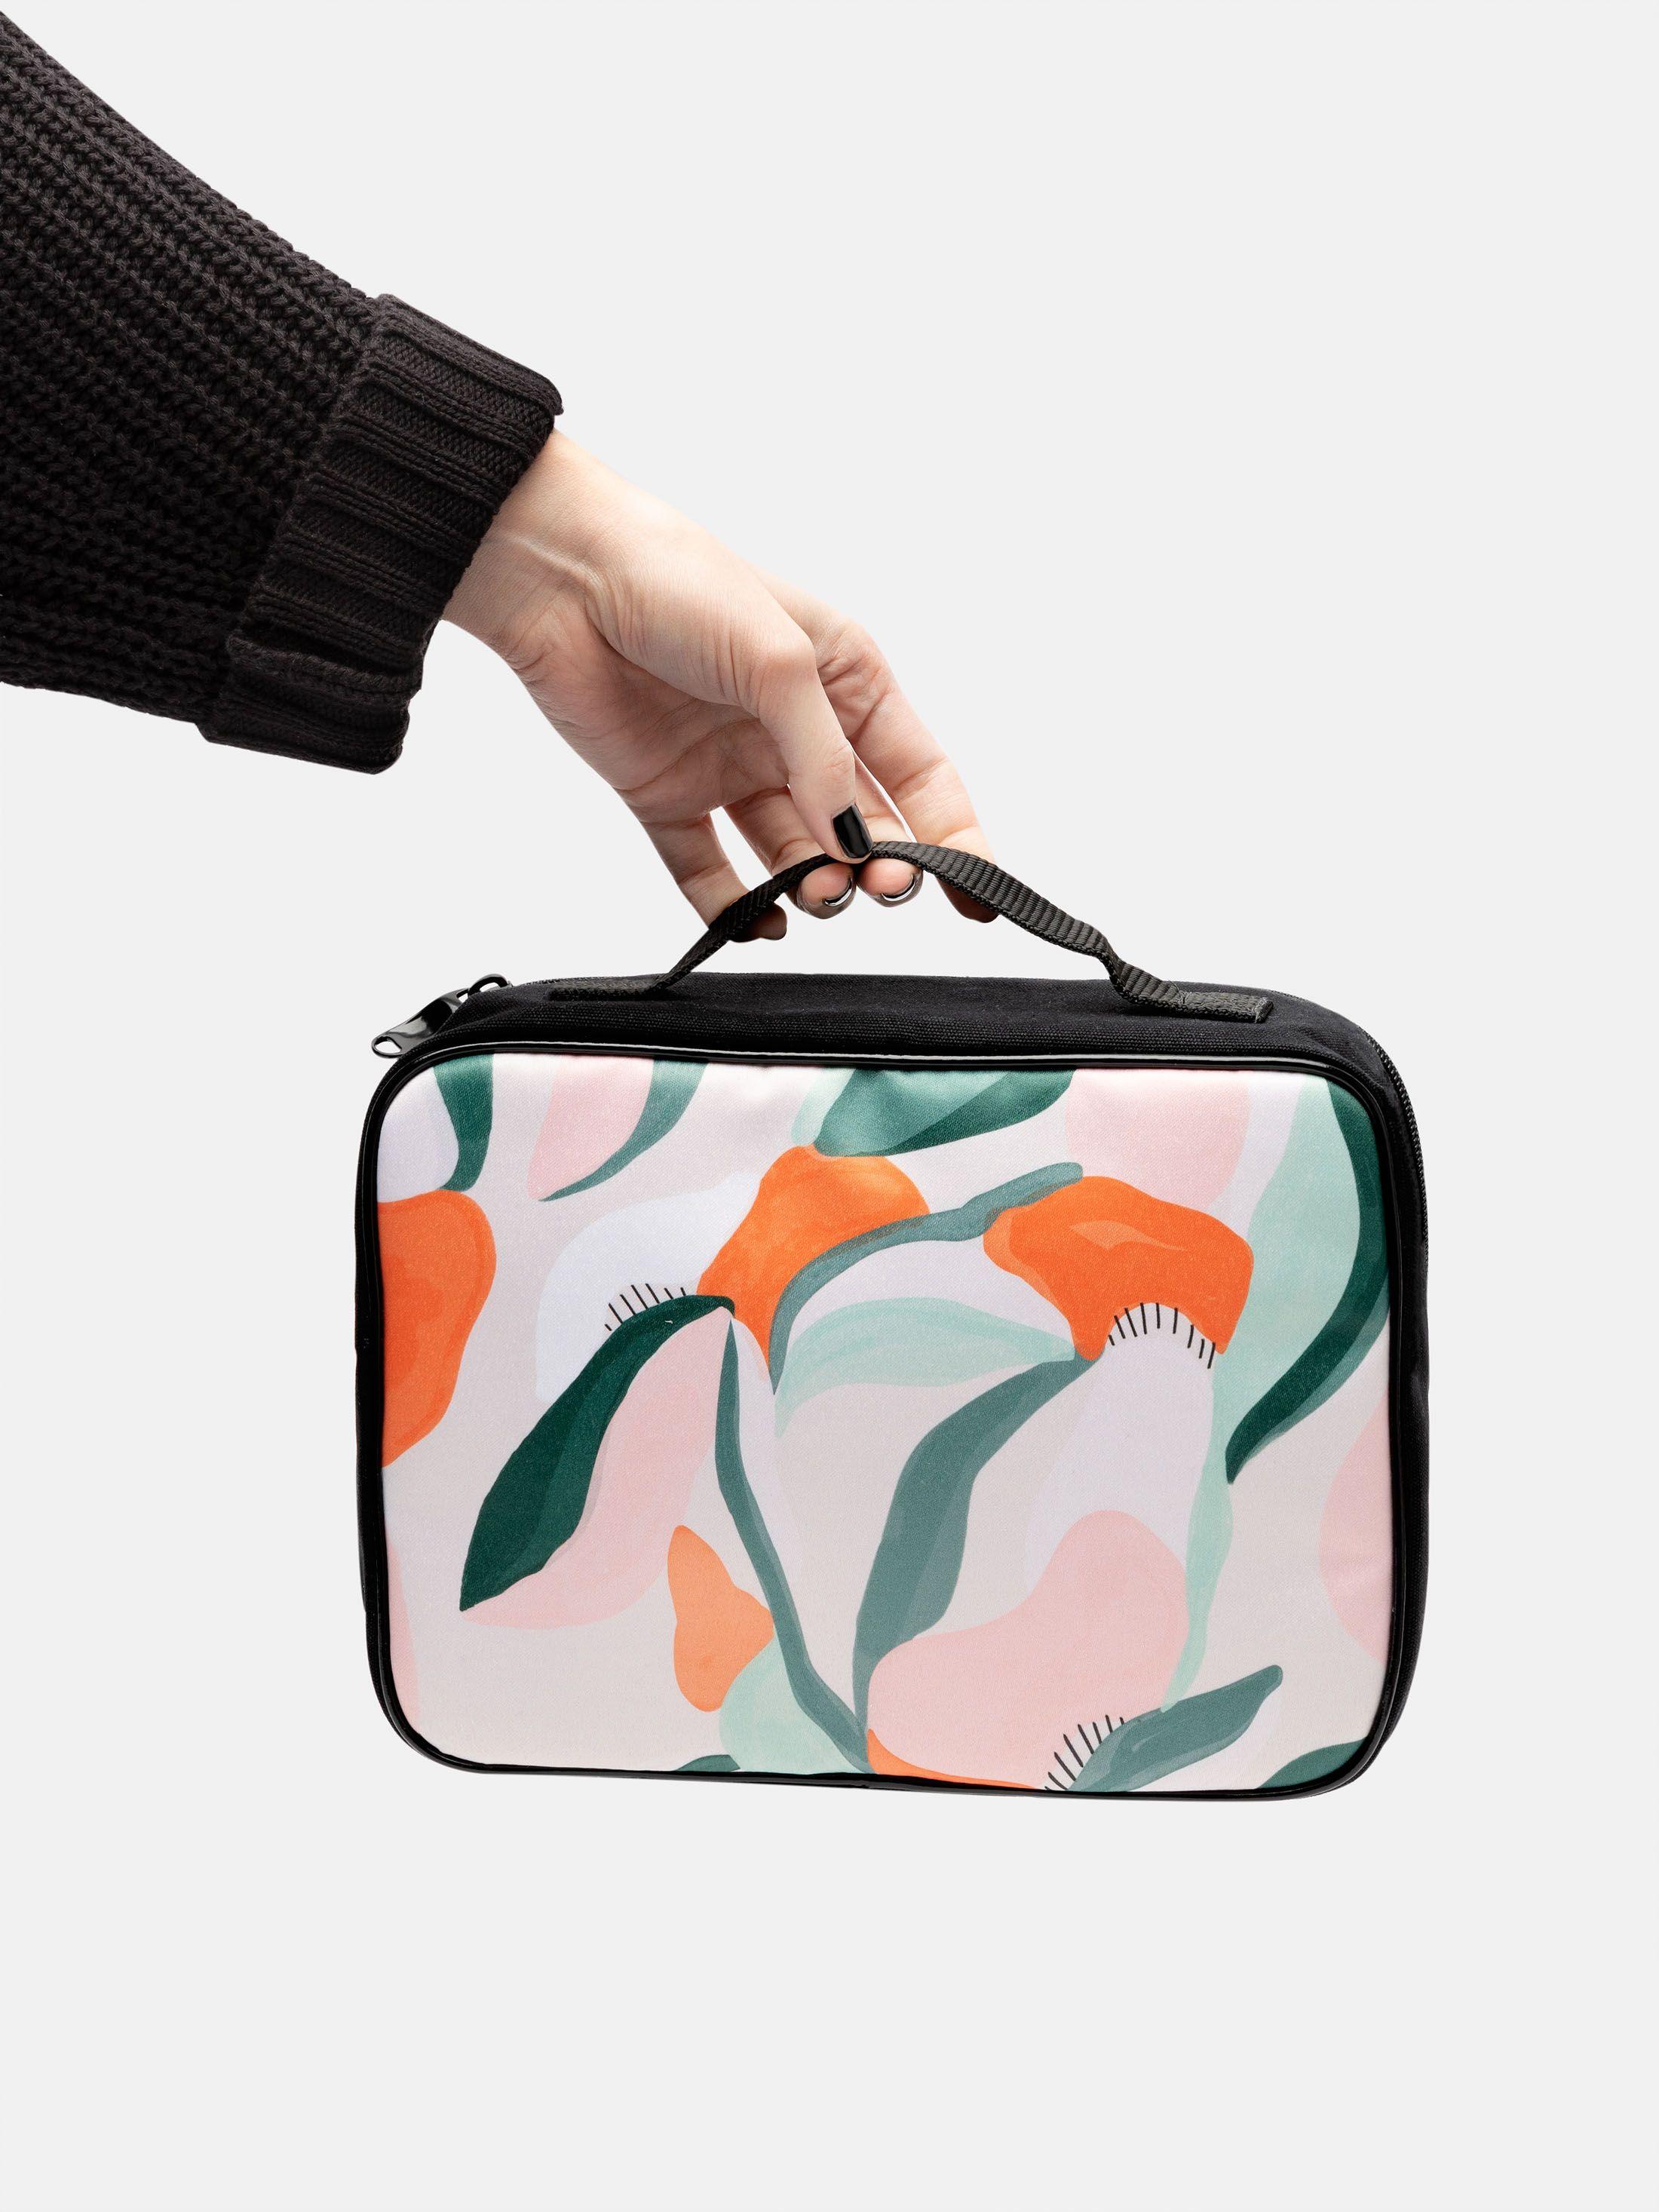 Customized Lunch Bag Handmade